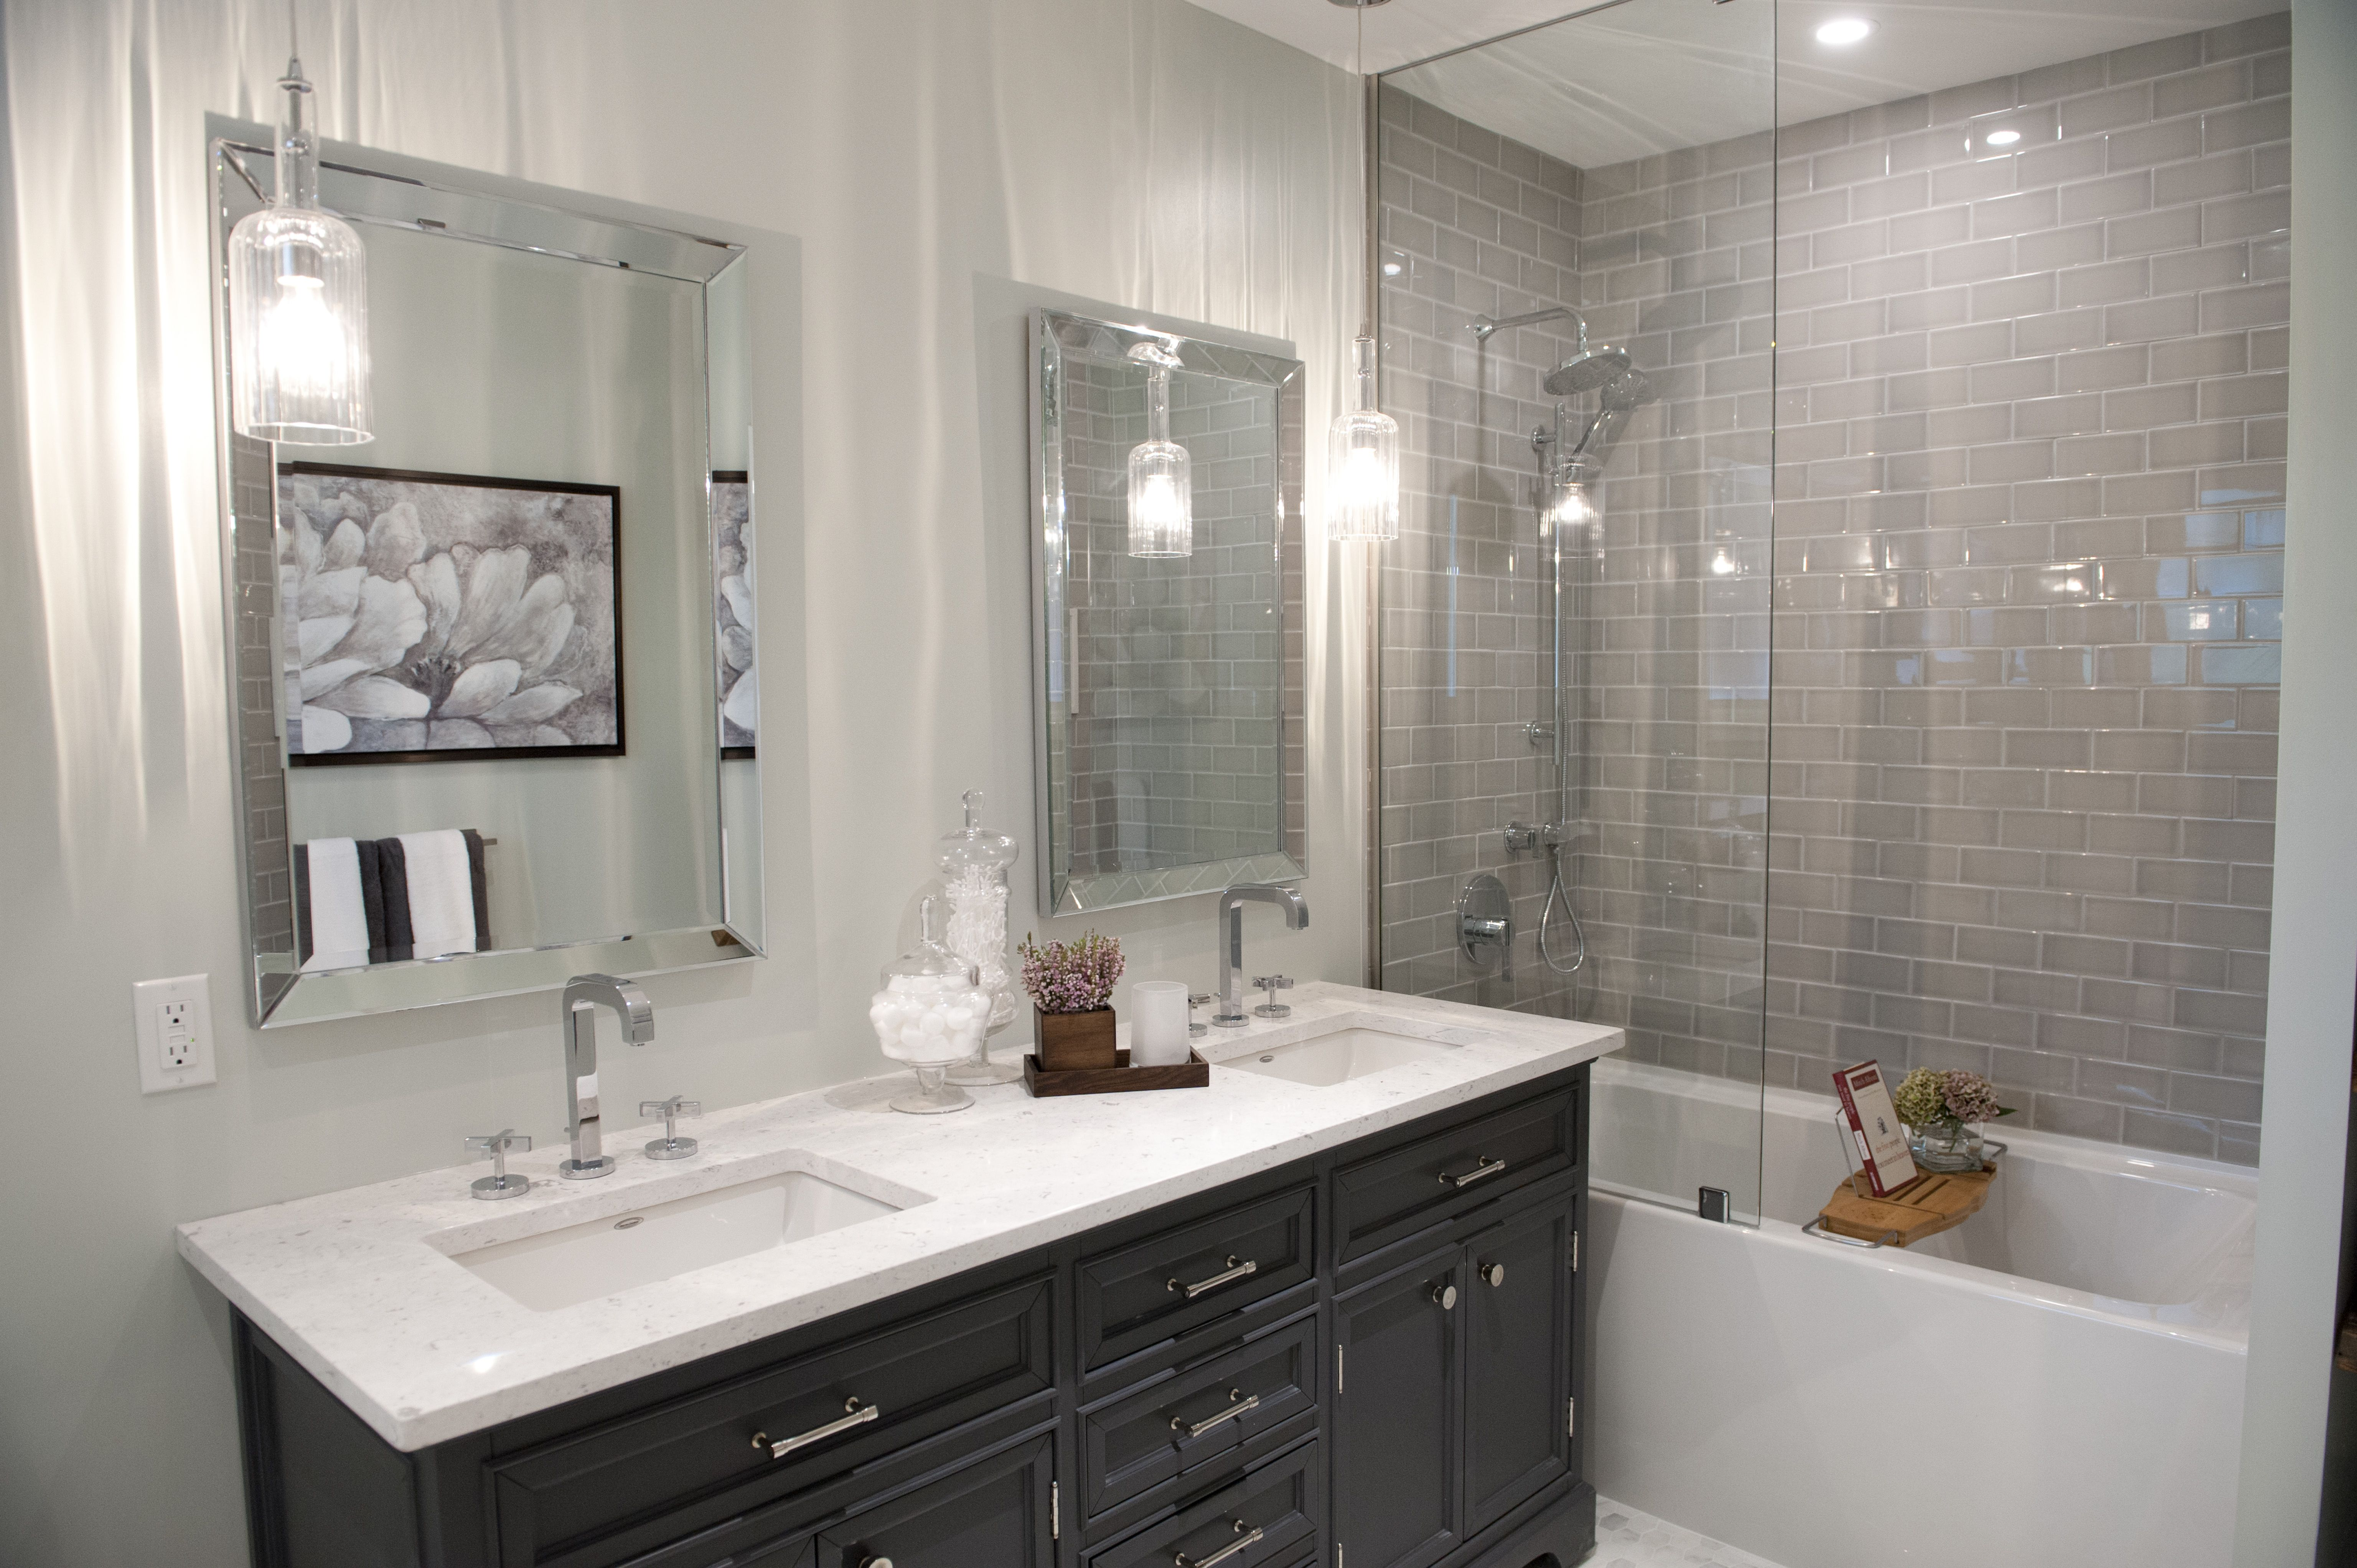 Property Brothers Bathroom Remodels - Bathroom Design Ideas